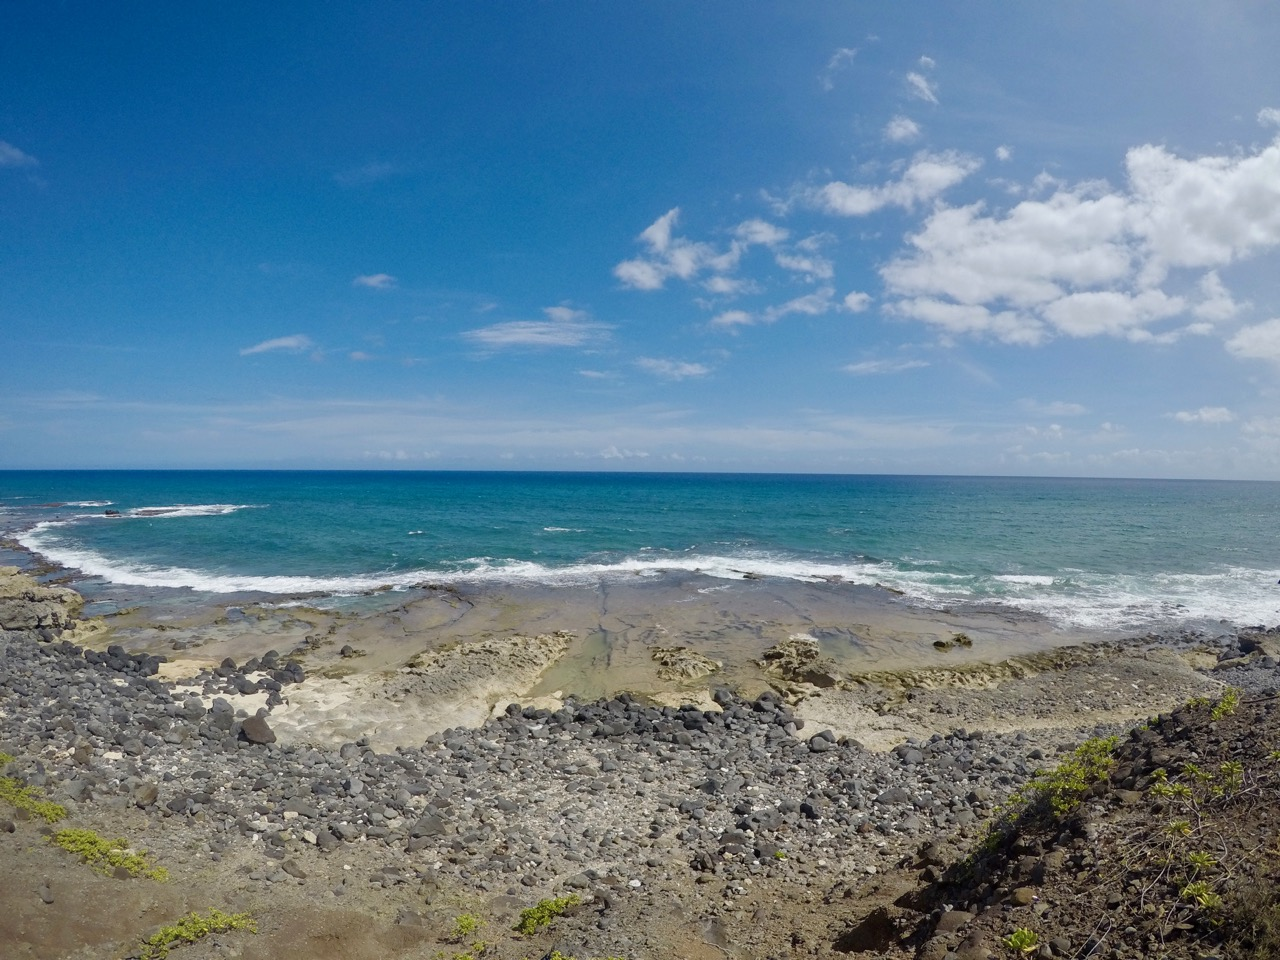 photo of the beach